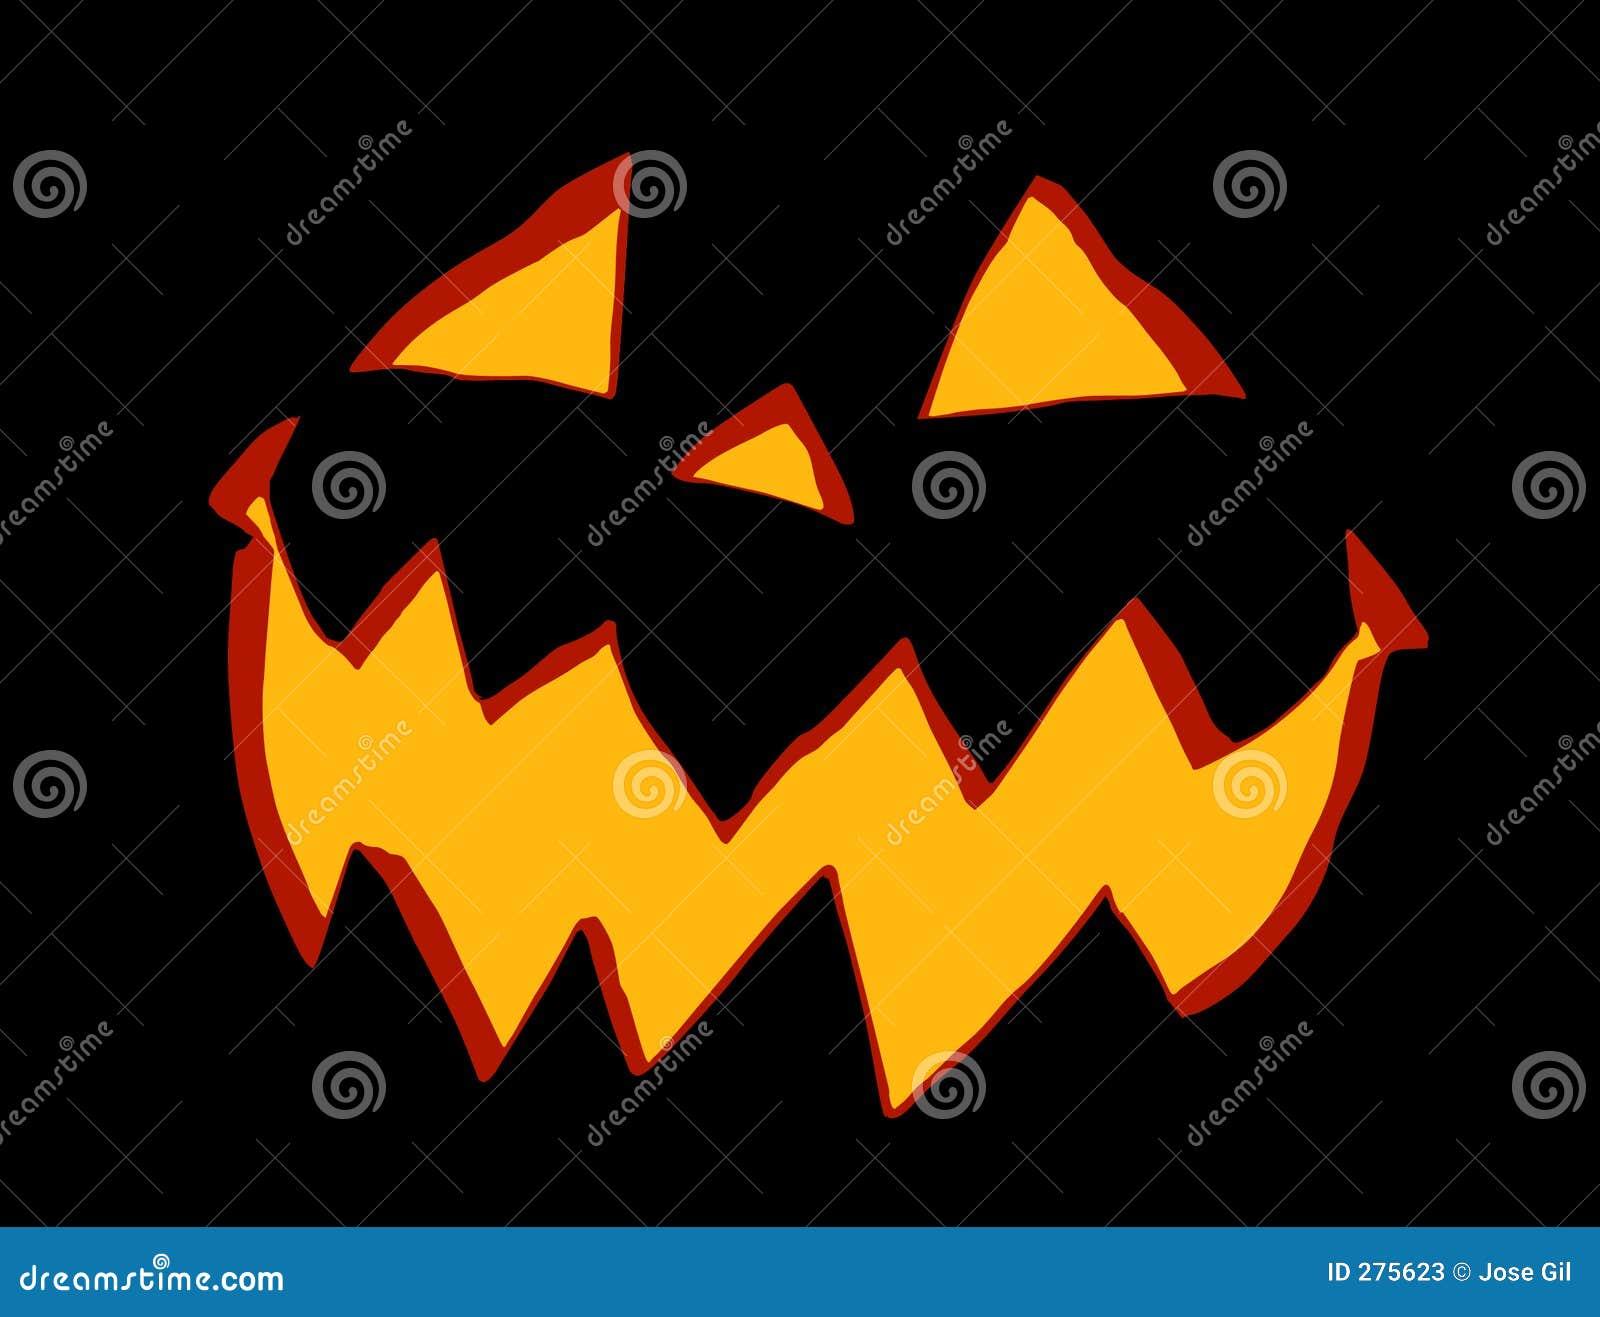 Jack o Lantern 3 color stock illustration. Illustration of fright ...